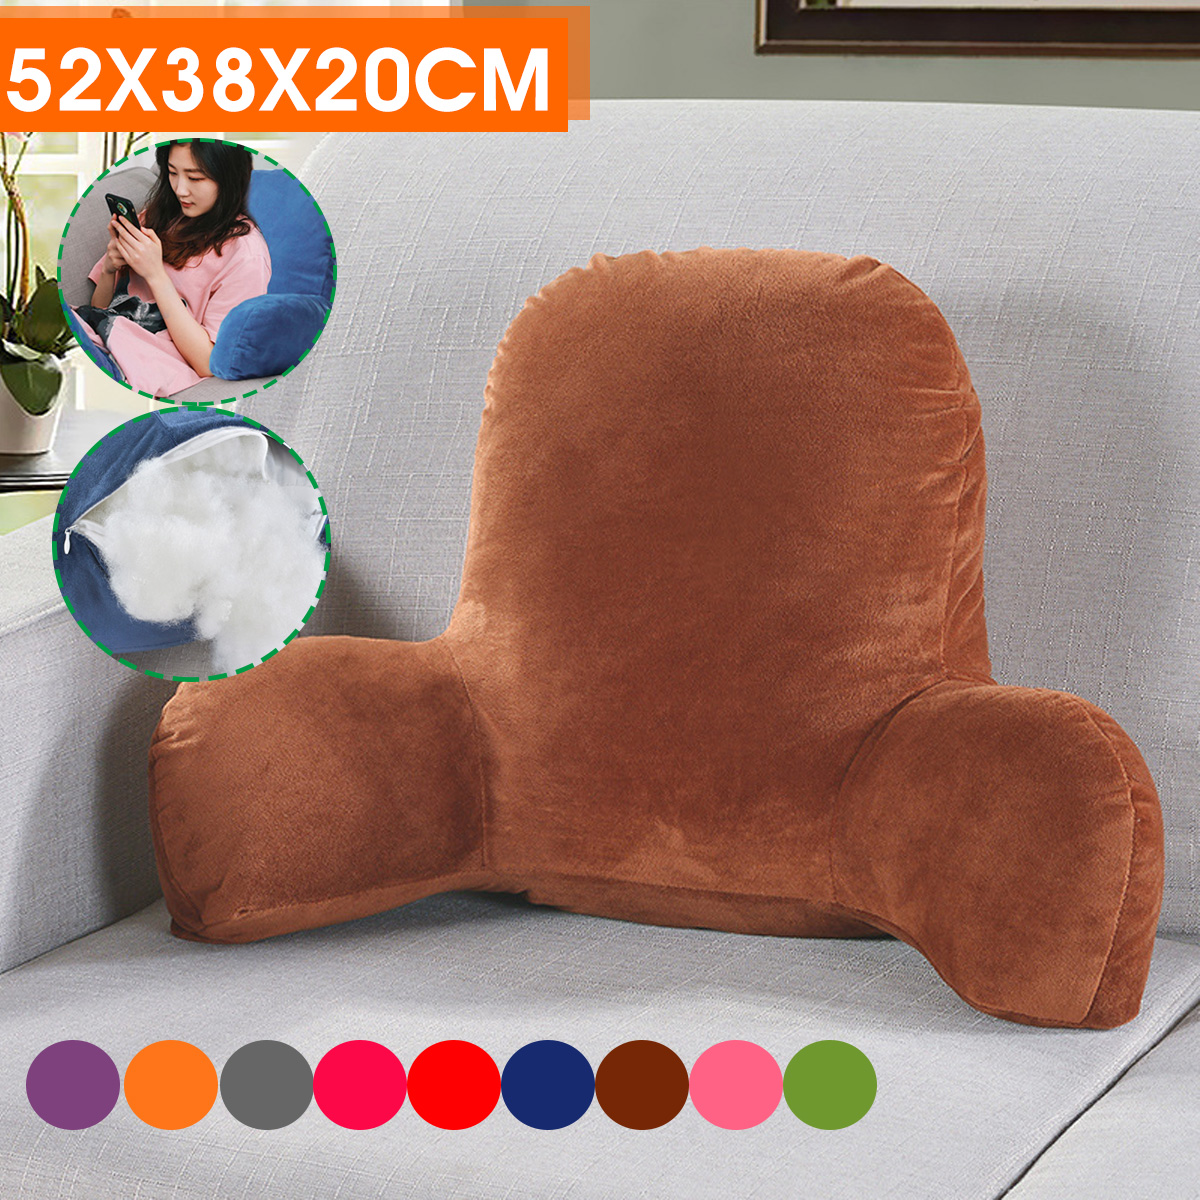 t shape lounger sofa chair bed reading back rest lumbar cushion pillow